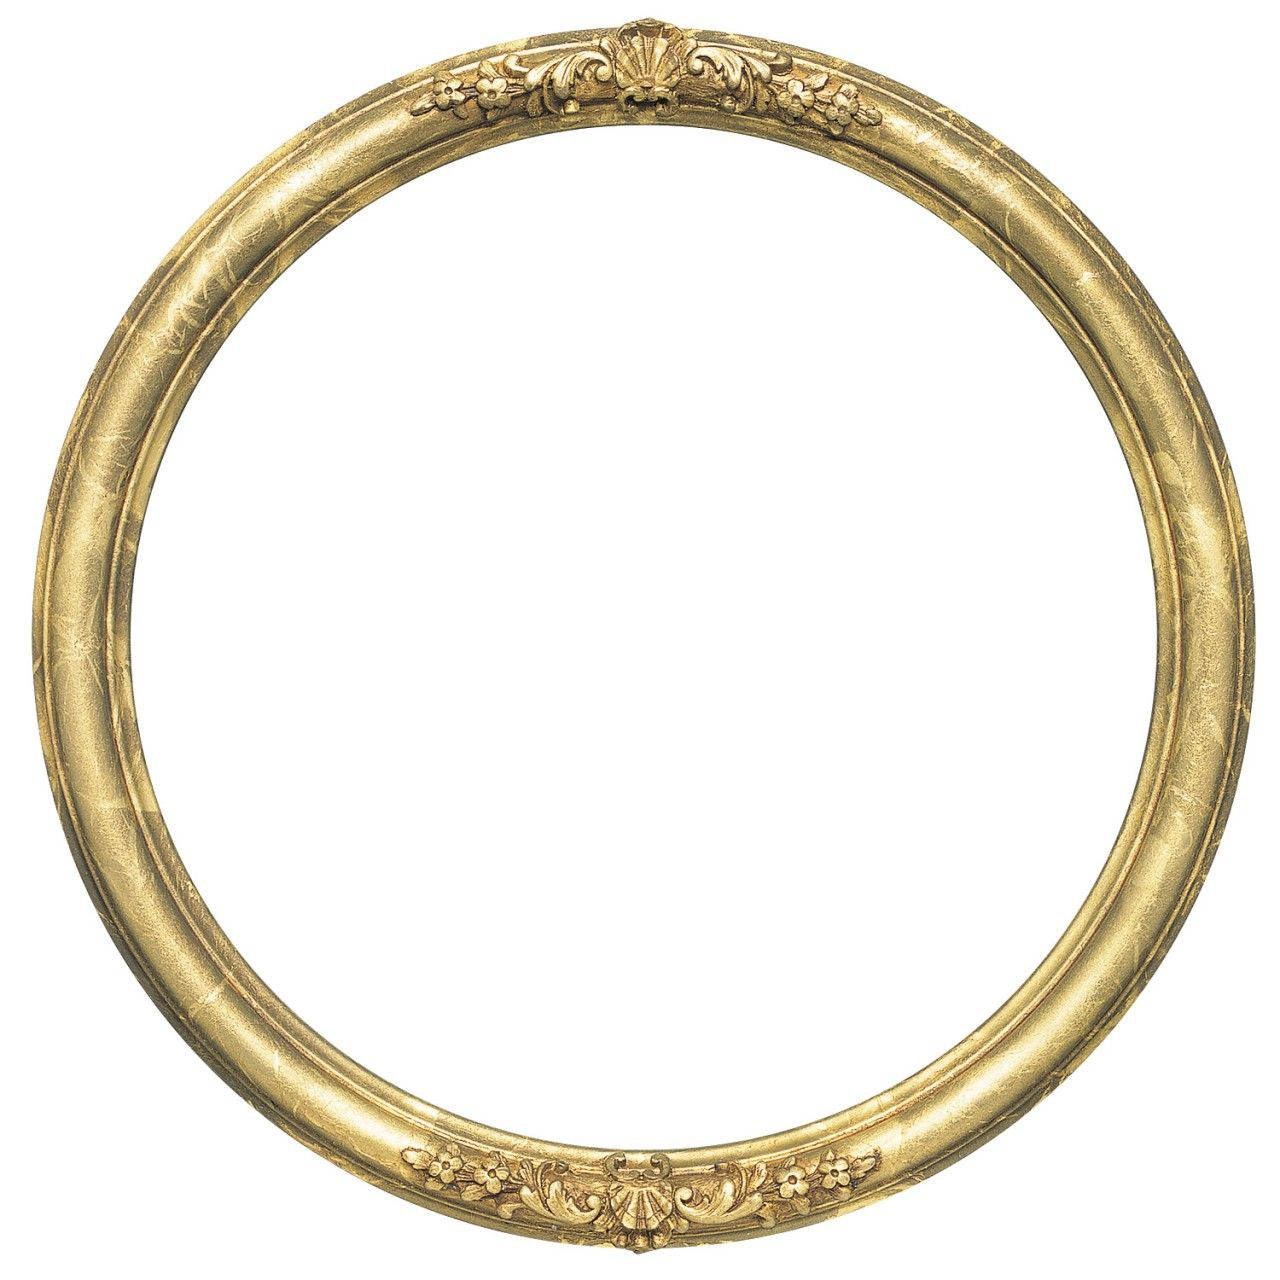 Round Frame In Champange Gold Finish Gold Leaf Picture Frames With Dark Shadding Ornate Decoratio Round Picture Frames Oval Picture Frames Picture Frame Decor